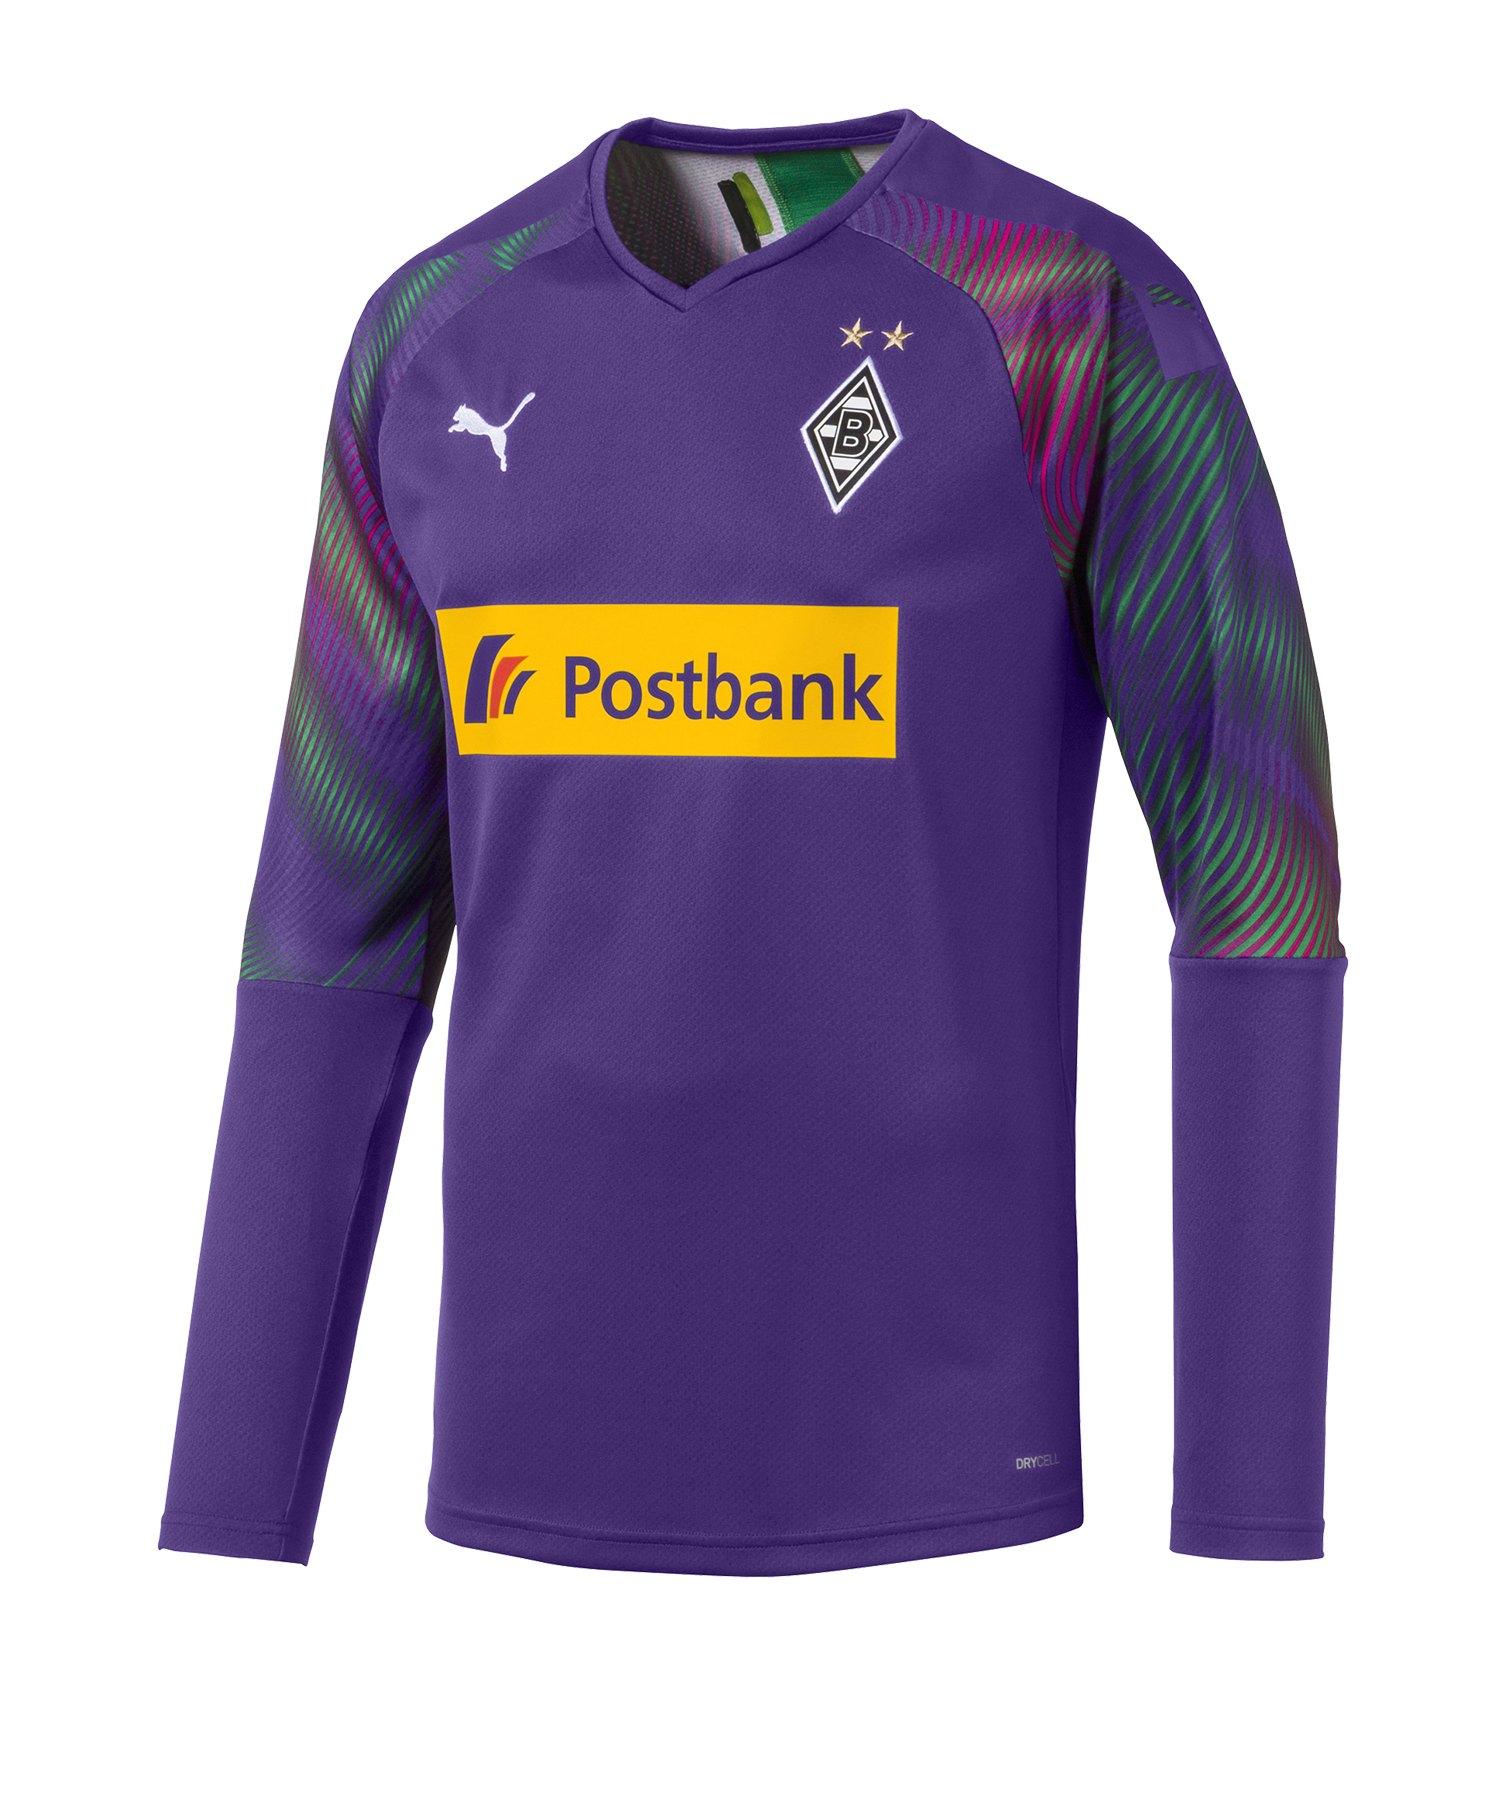 PUMA Borussia Mönchengladbach TW-Trikot 19/20 F06 - Lila